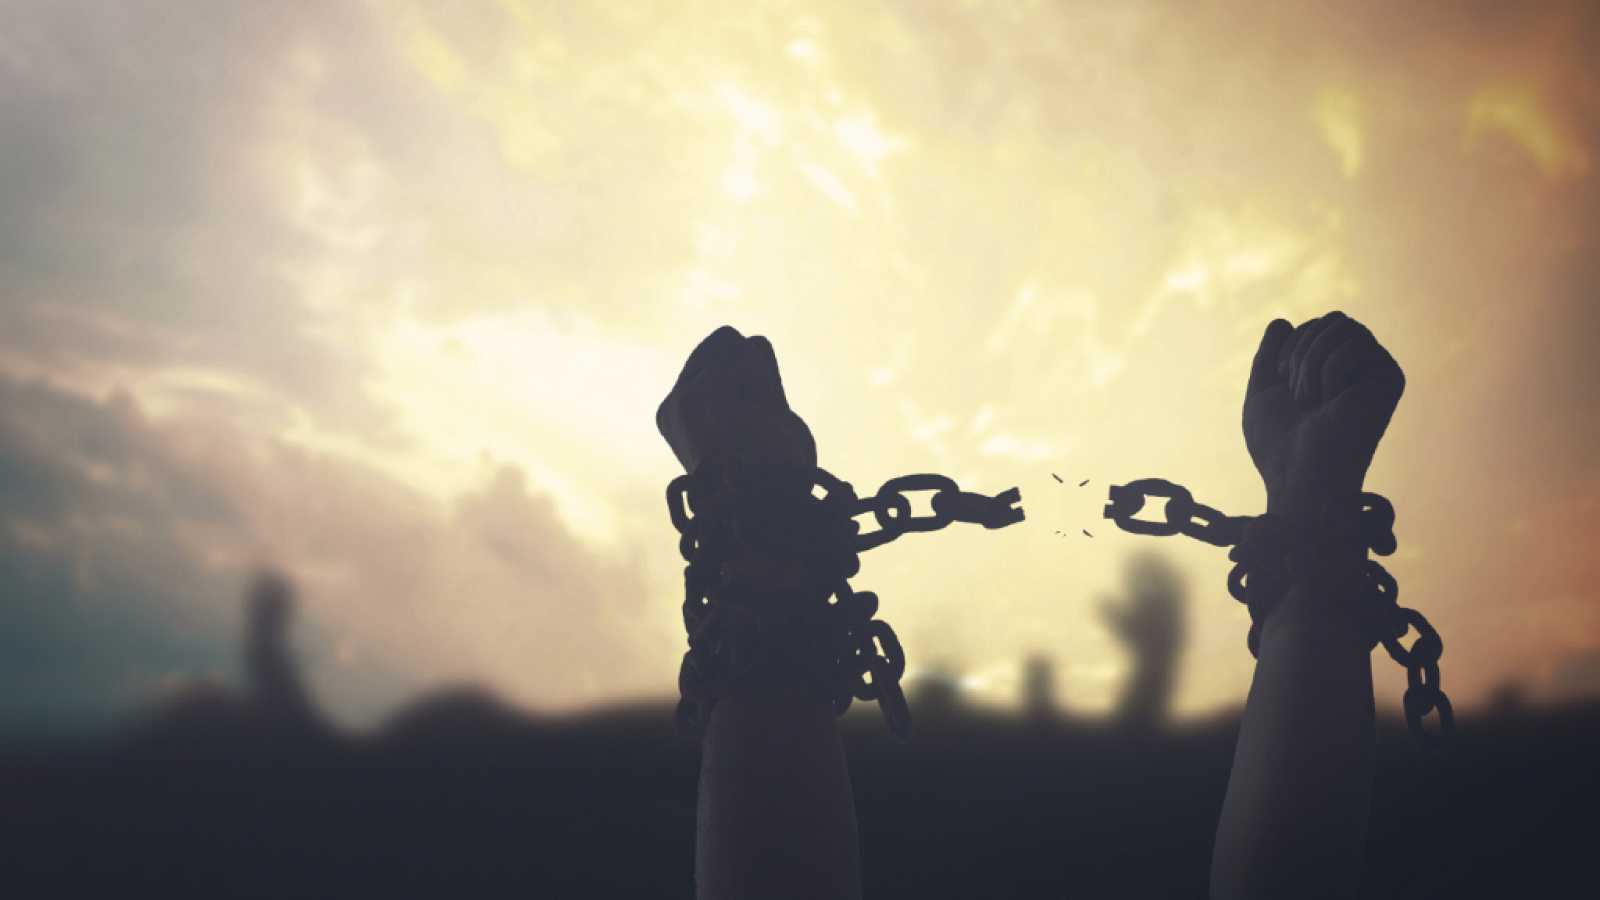 Cinco continentes - Mauritania: esclavistas impunes - Escuchar ahora